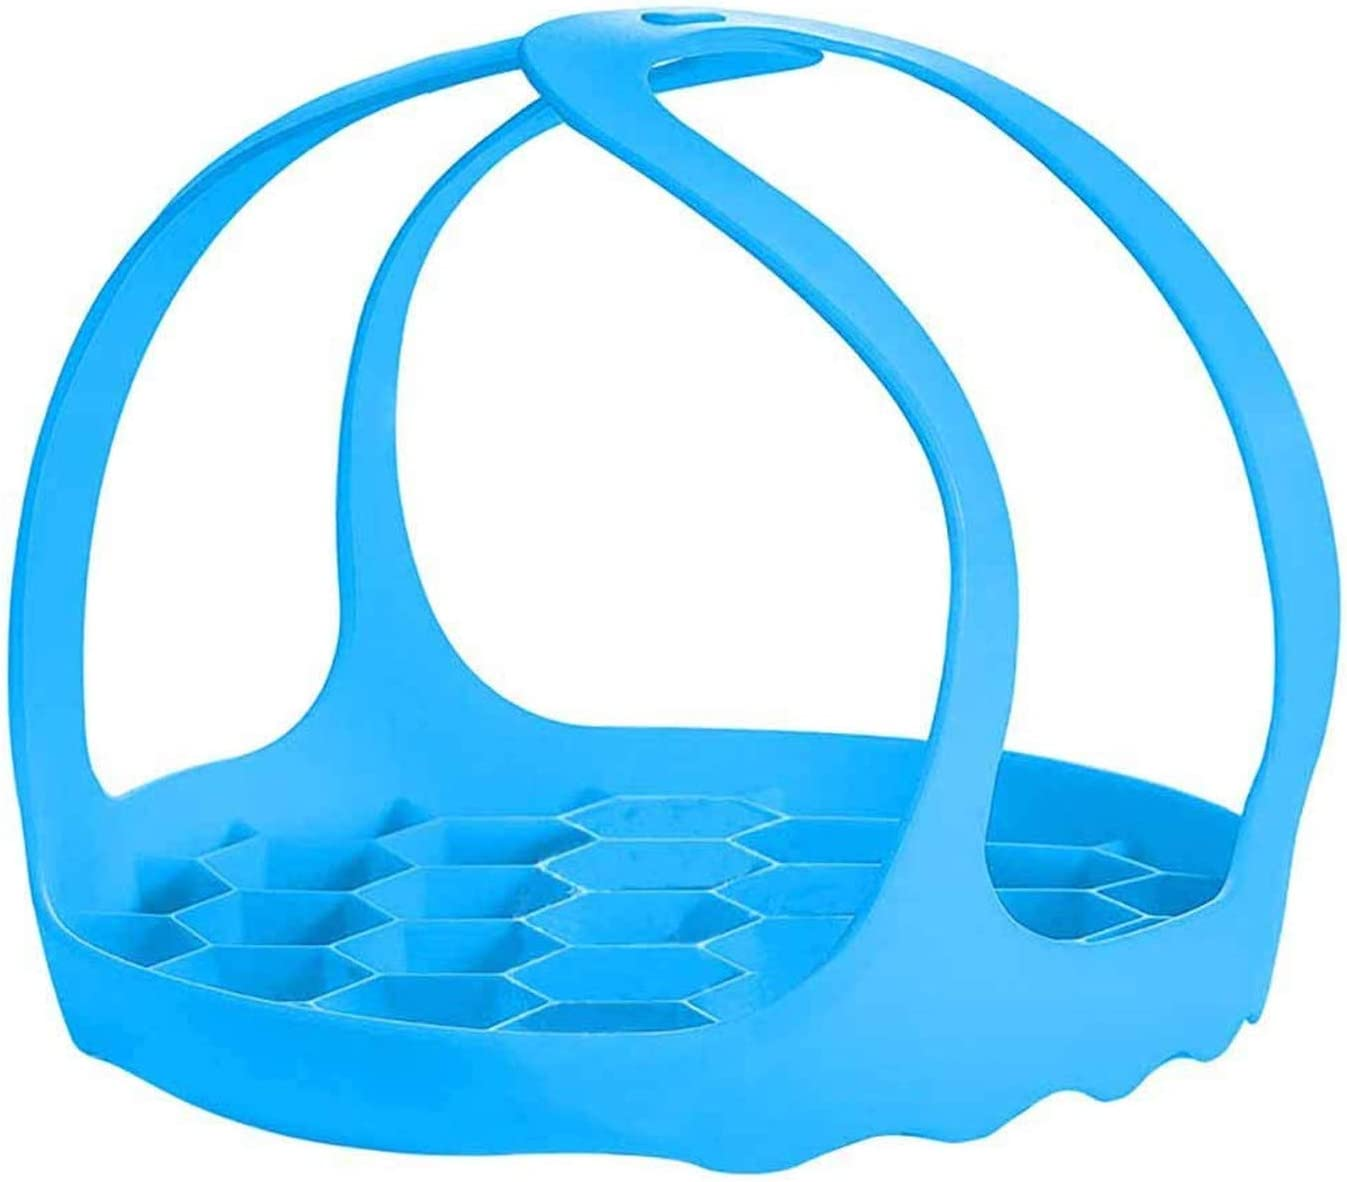 Pressure Cooker Sling bakeware sling for instant pot Lifter BPA-Free Silicone Egg Steamer Rack Anti-scalding Steamer Insert (Blue)